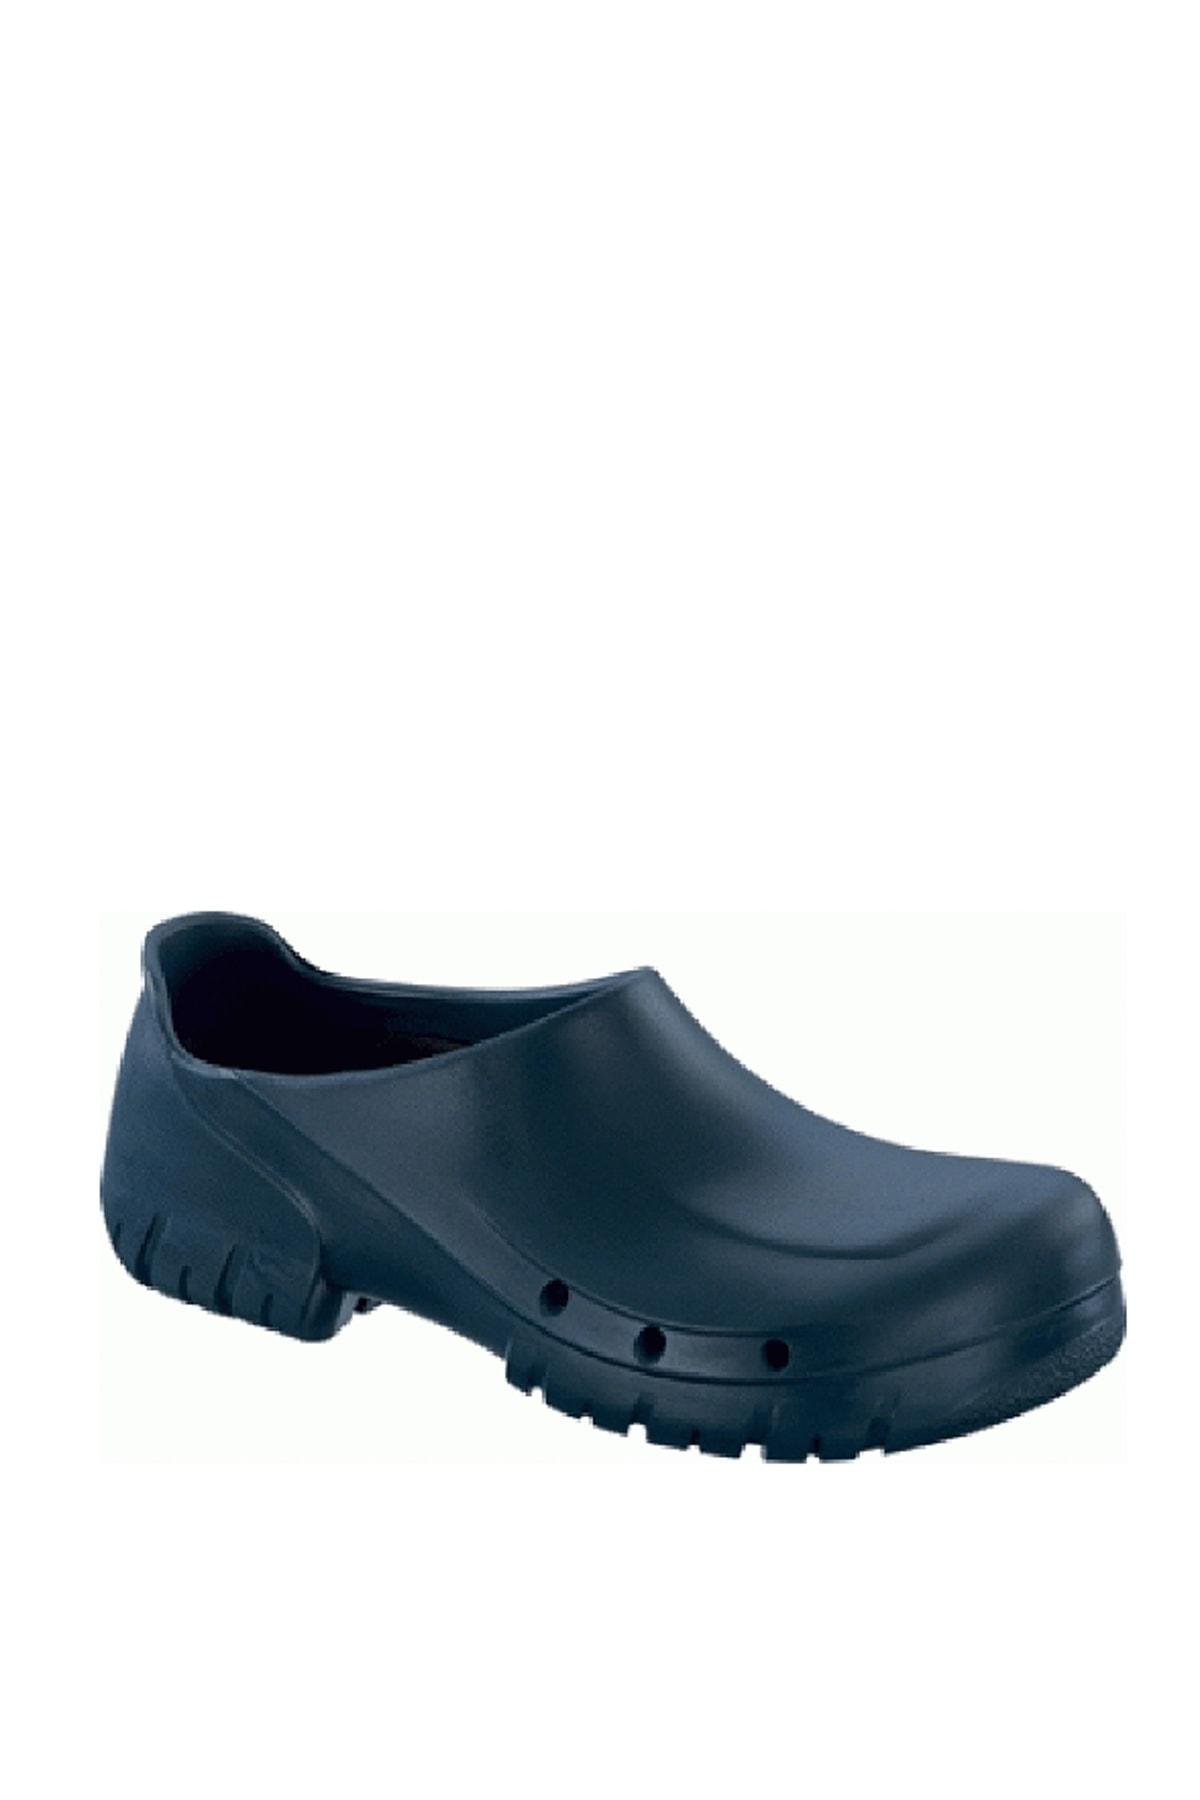 Alpro A 650 Aır Mavi Ayakkabı